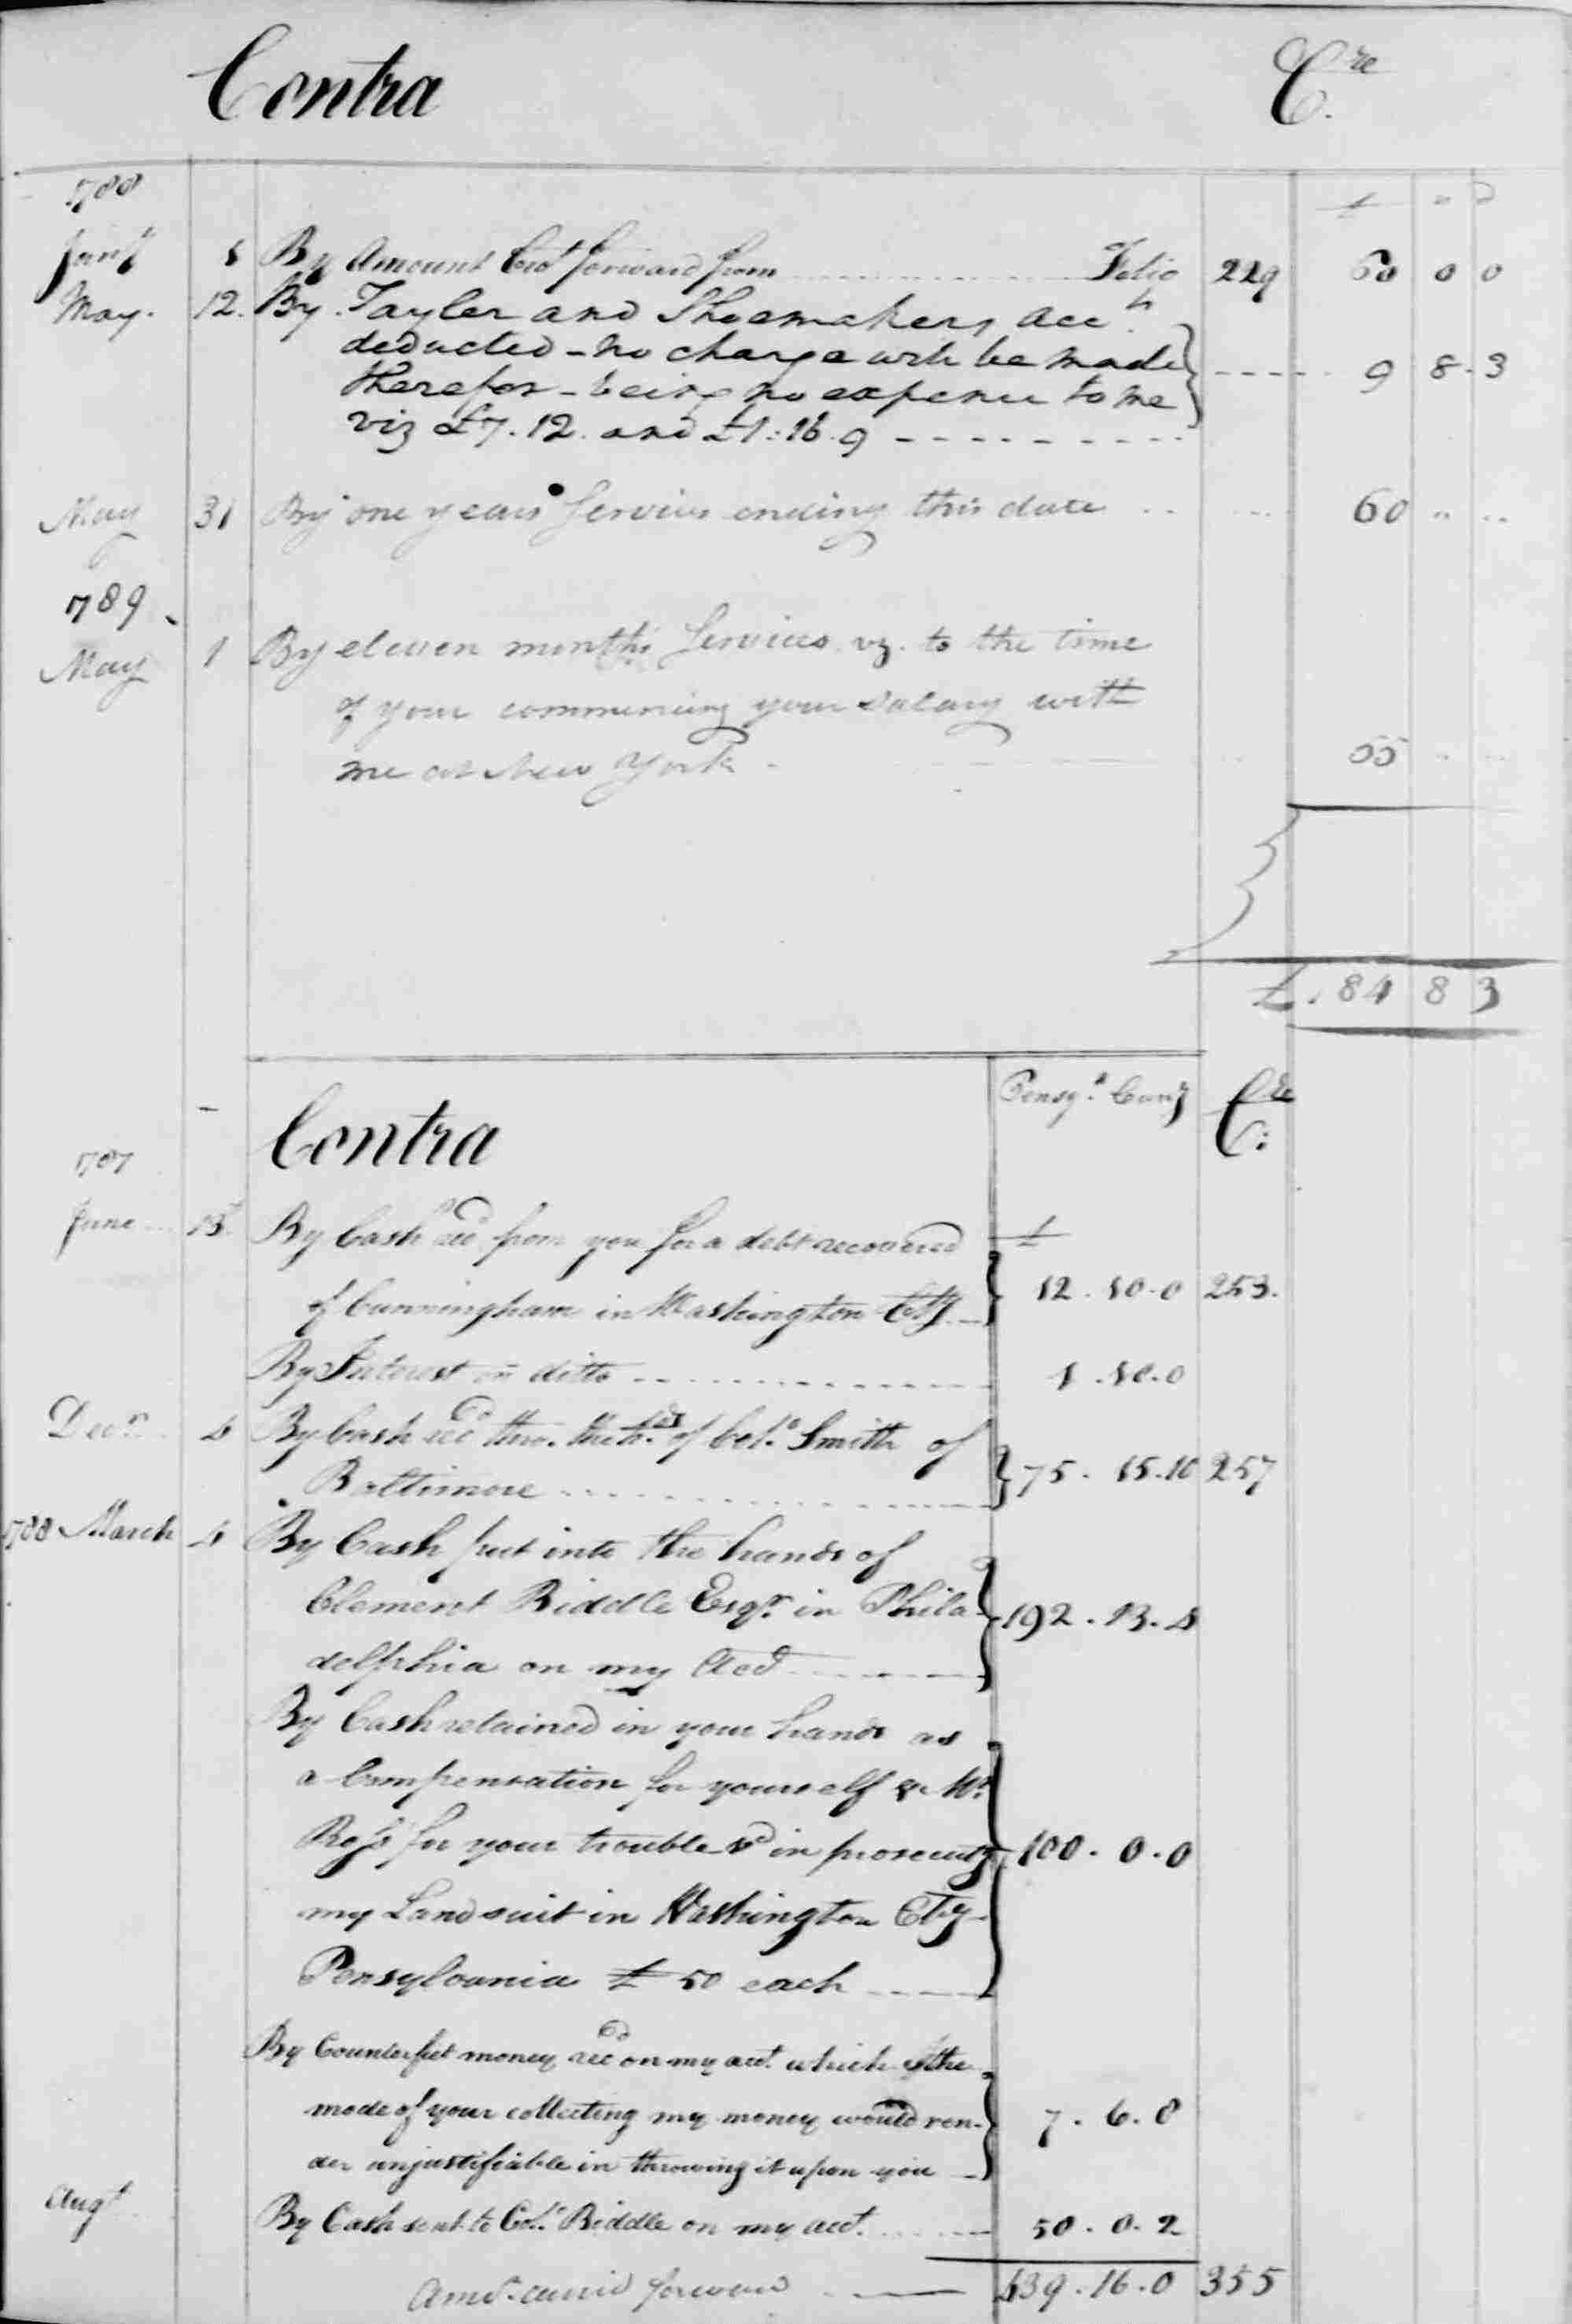 Ledger B, folio 259, right side